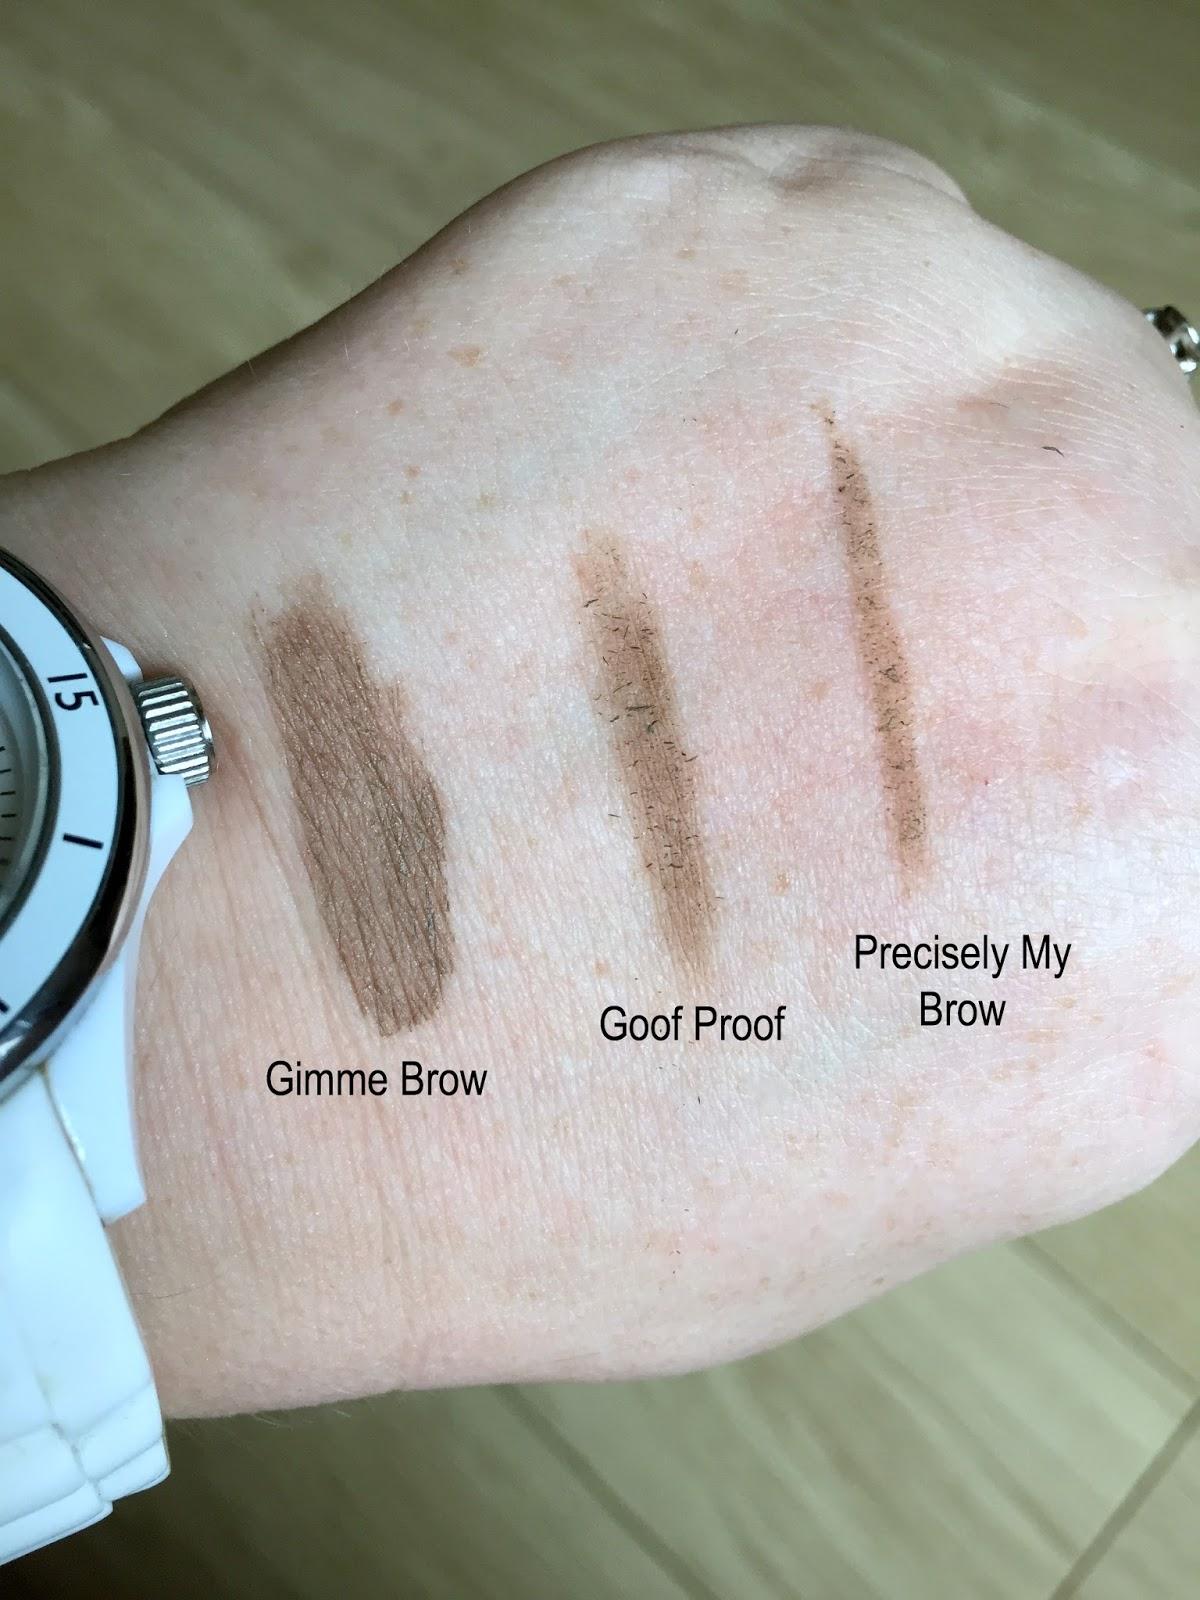 Gimme Brow+ Volumizing Eyebrow Gel by Benefit #13